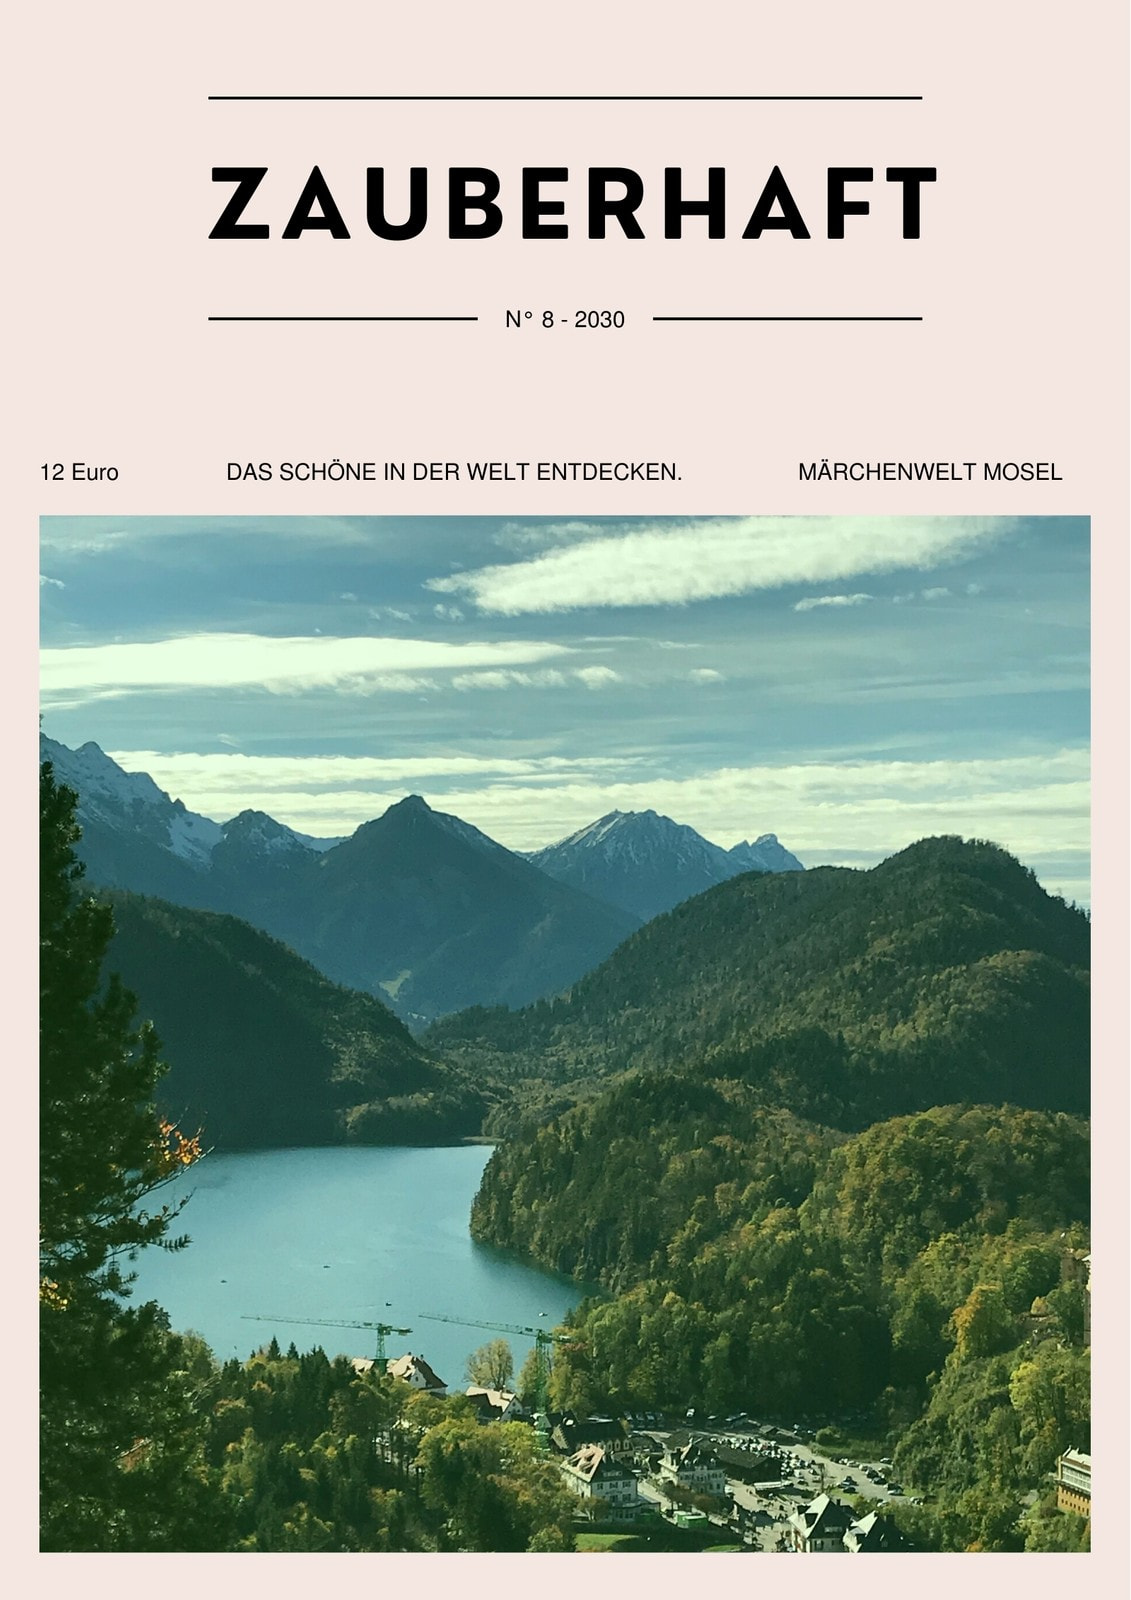 Rosa-grünes Magazin-Cover Mit Foto Reisen Zauberhaft